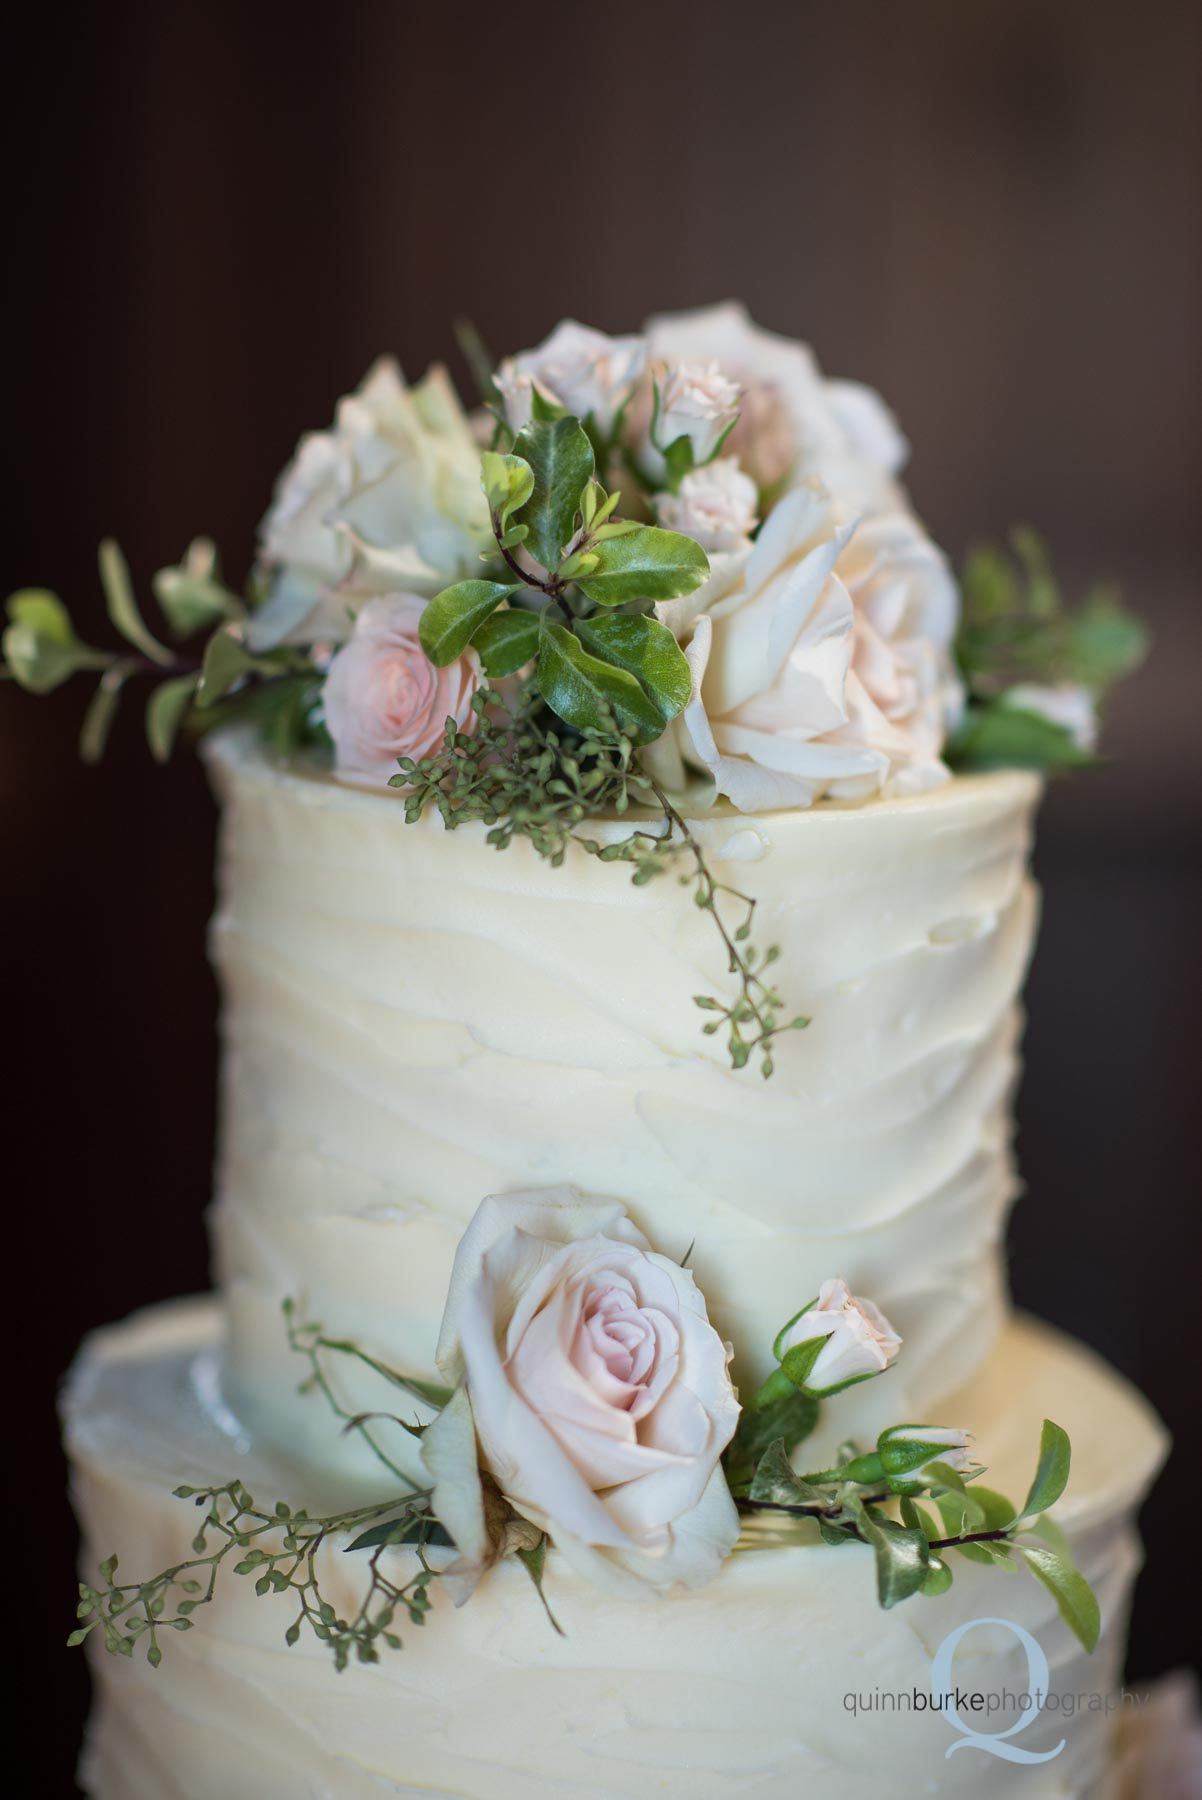 Perryhill Farm wedding cake roses